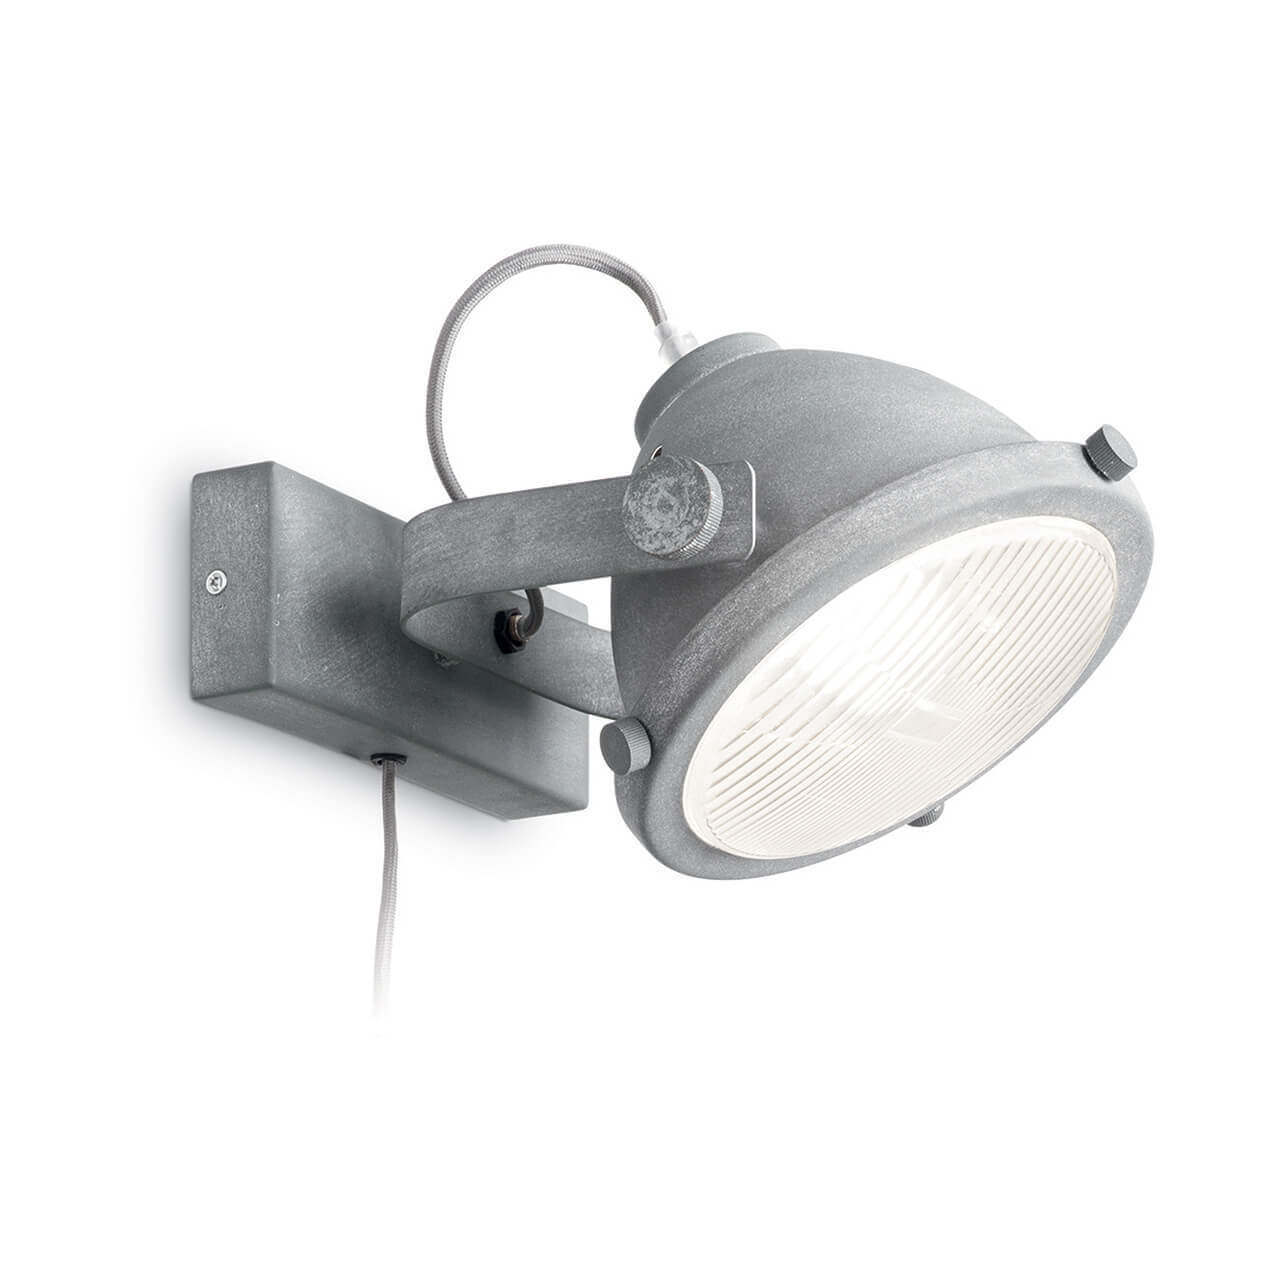 Спот Ideal Lux Reflector AP1 Reflector